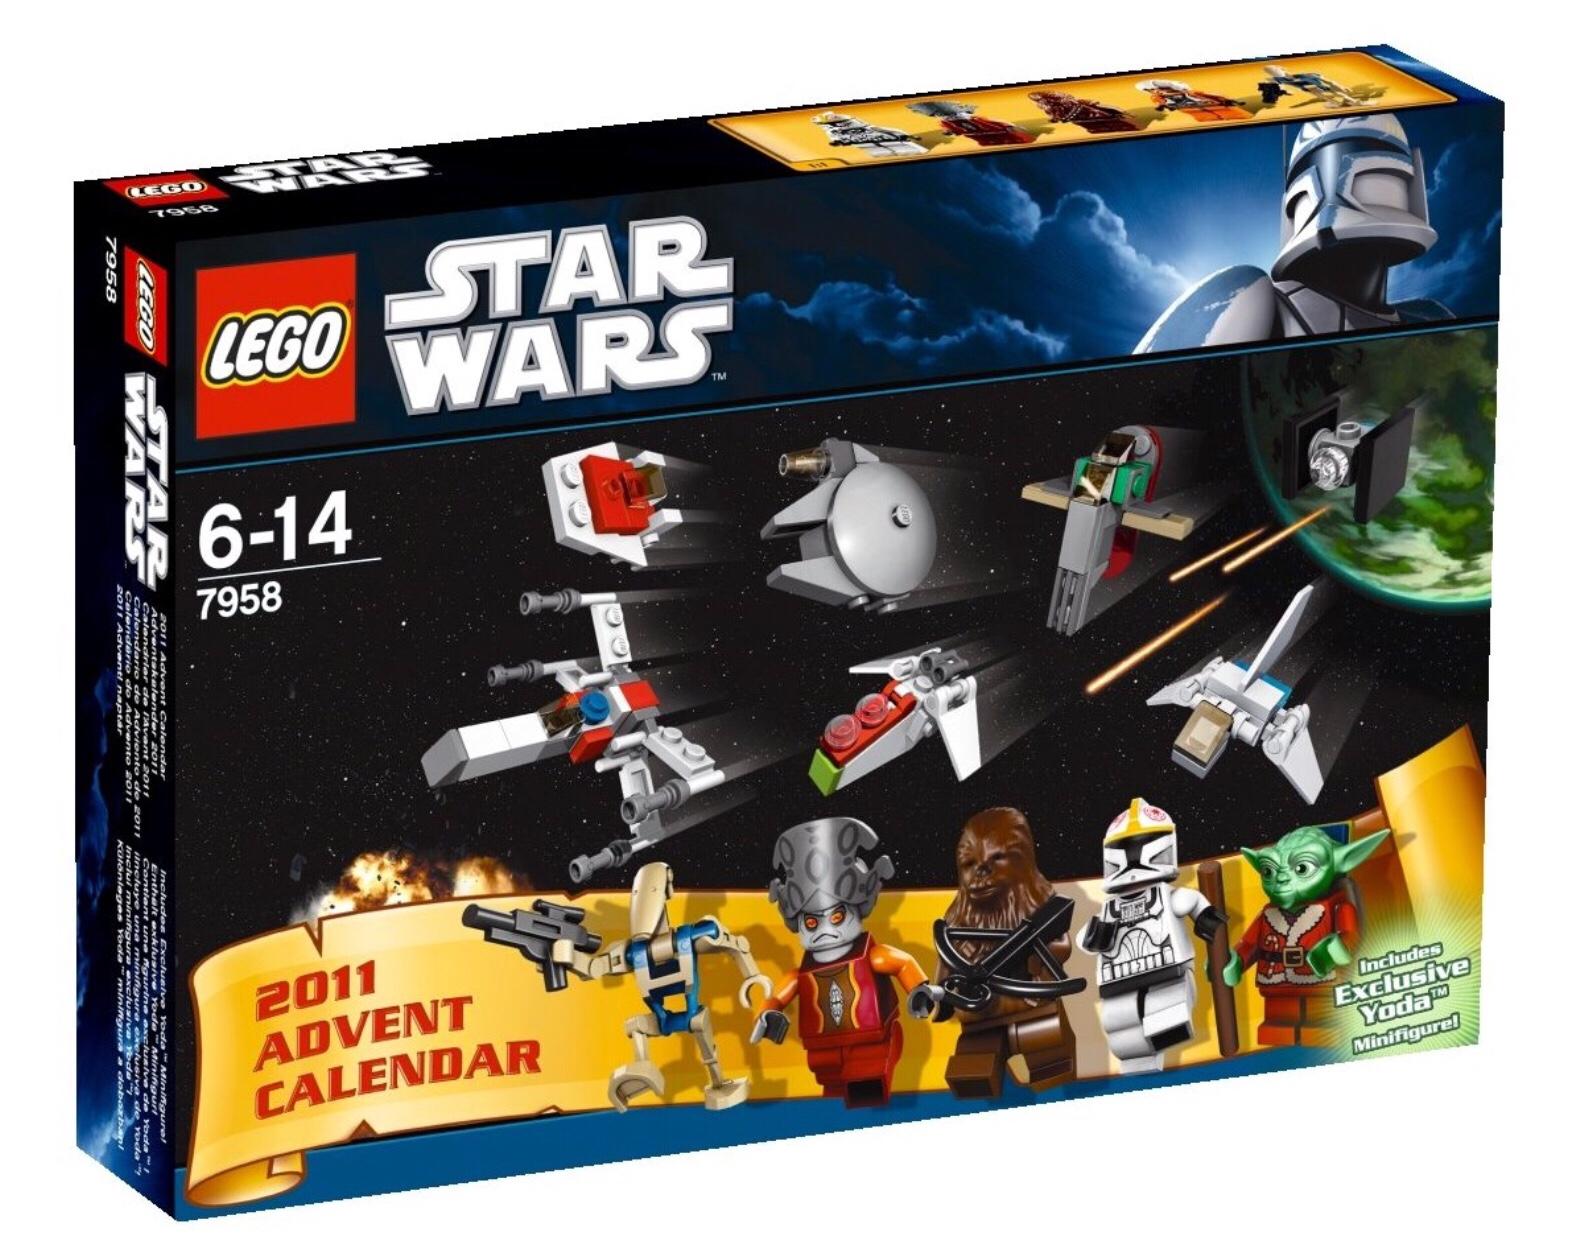 Lego Start Wars Advent Calendar